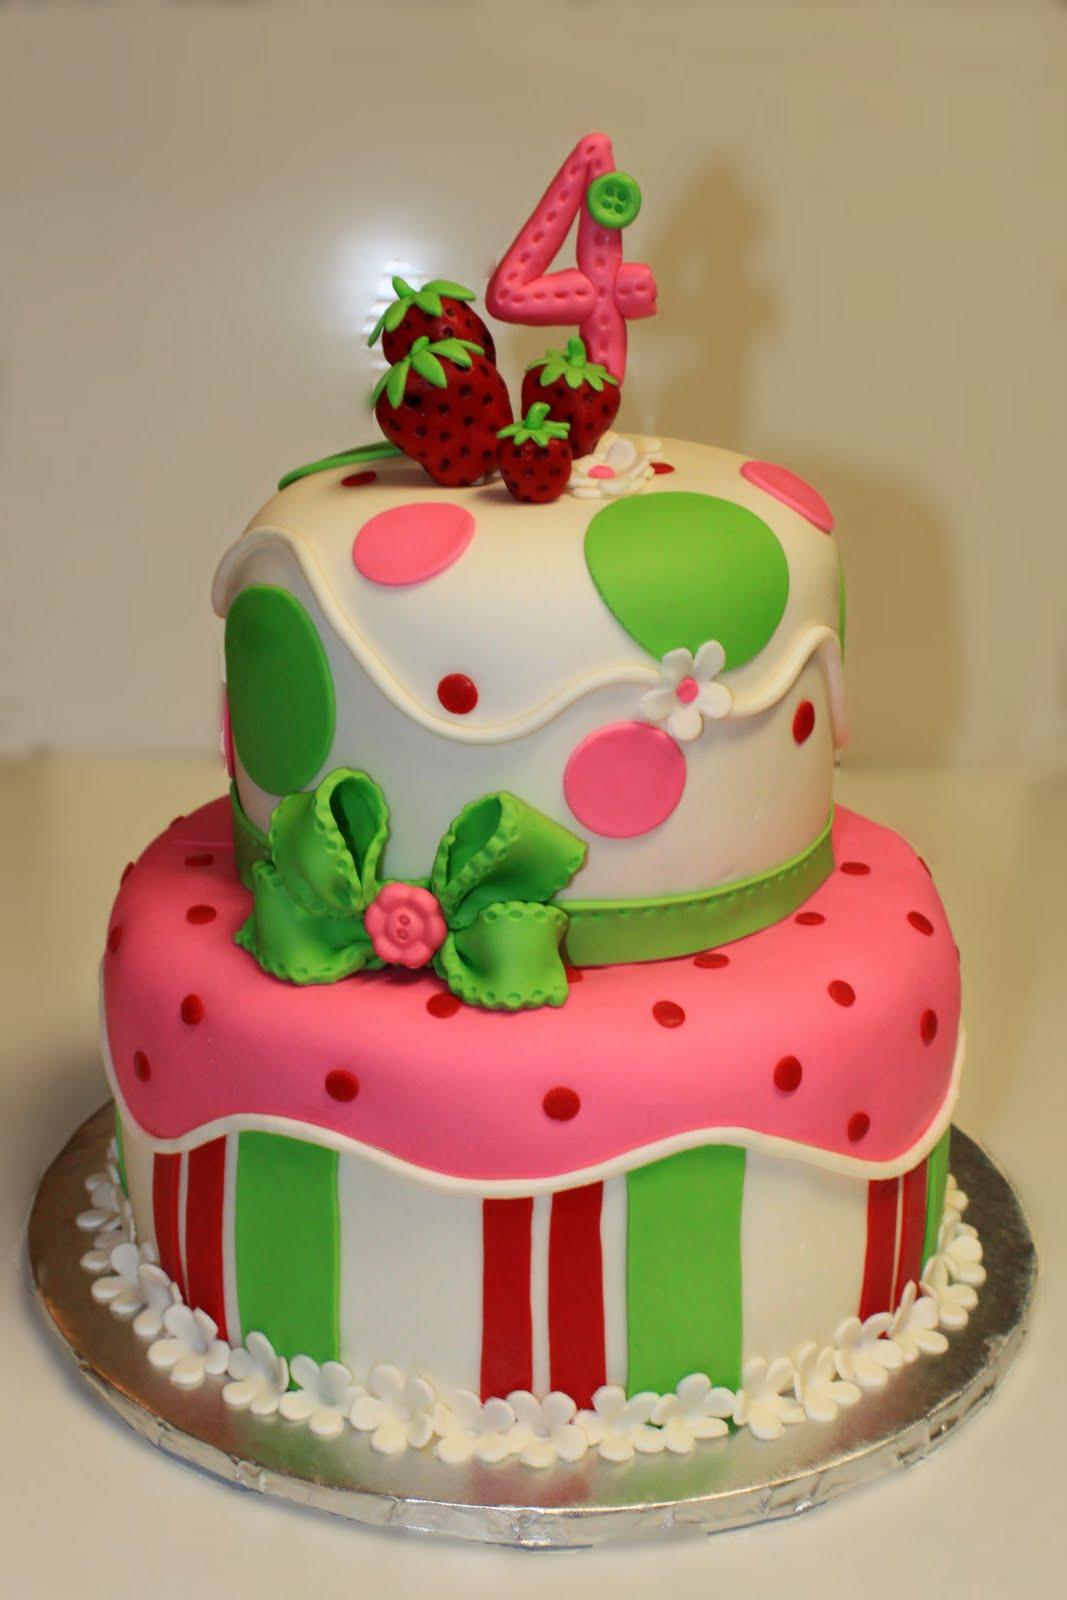 Strawberry Shortcake Cake  Layers of Love Strawberry Shortcake Cake and Cookies